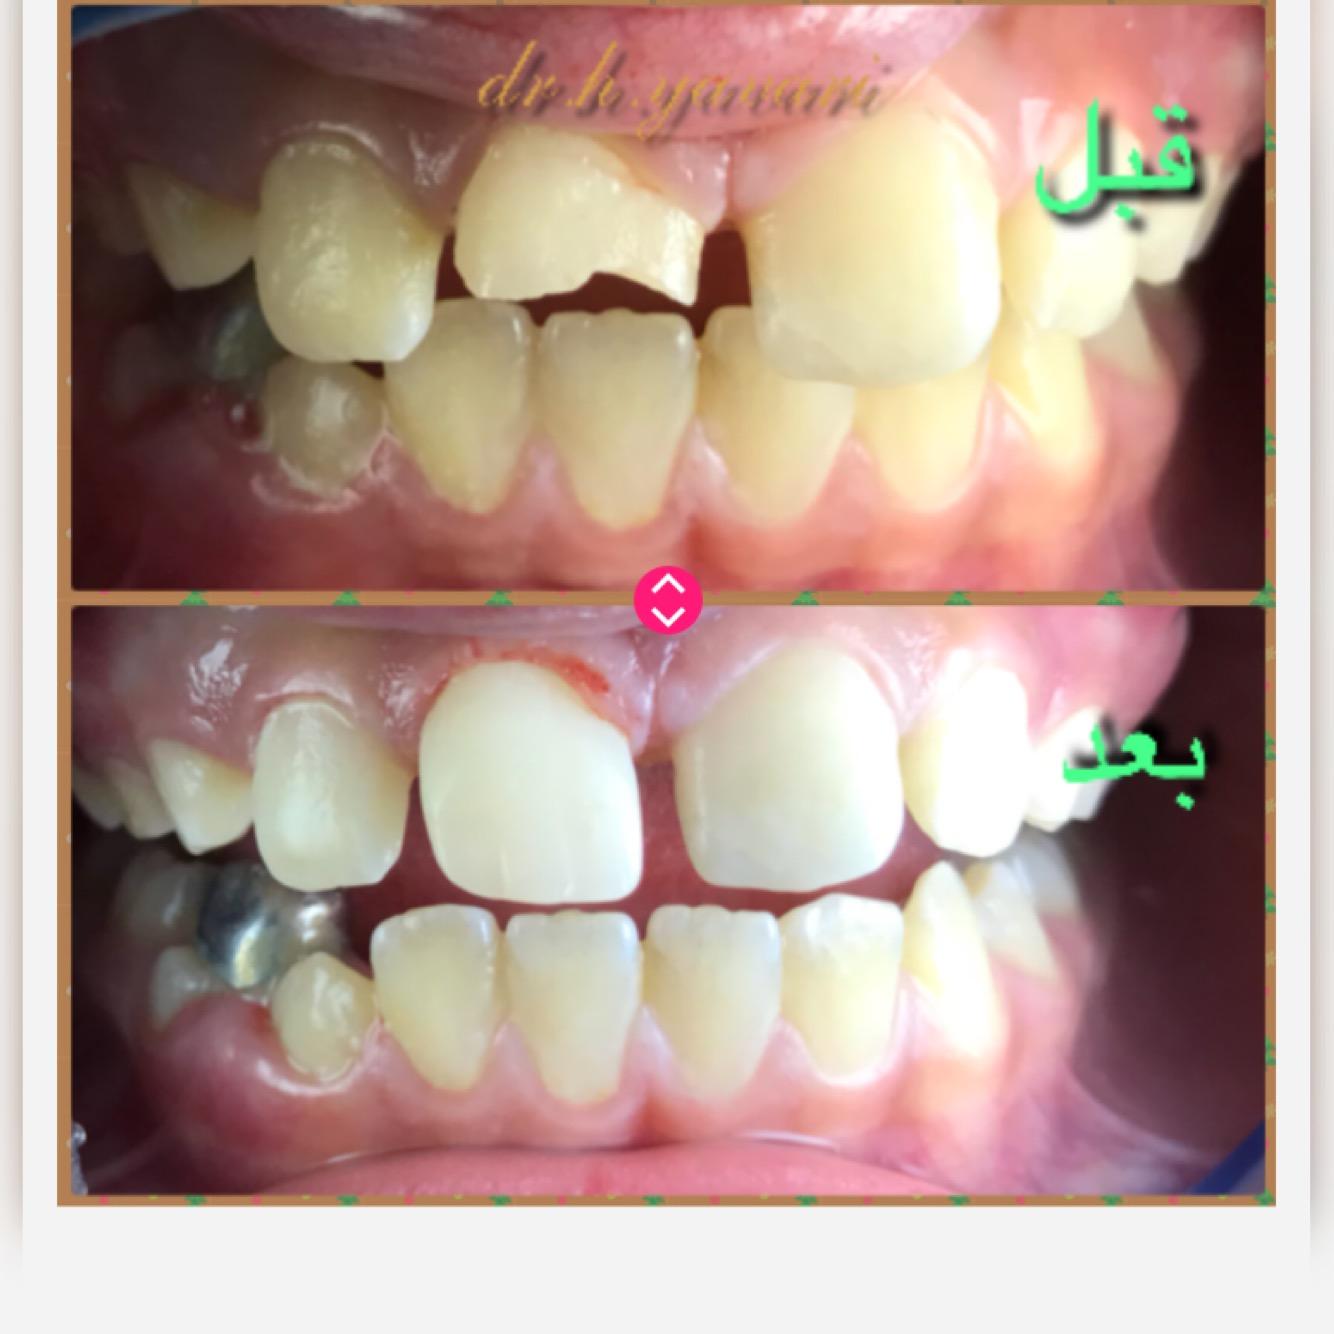 اصلاح شکستگی نوک دندان دختر ۹ ساله